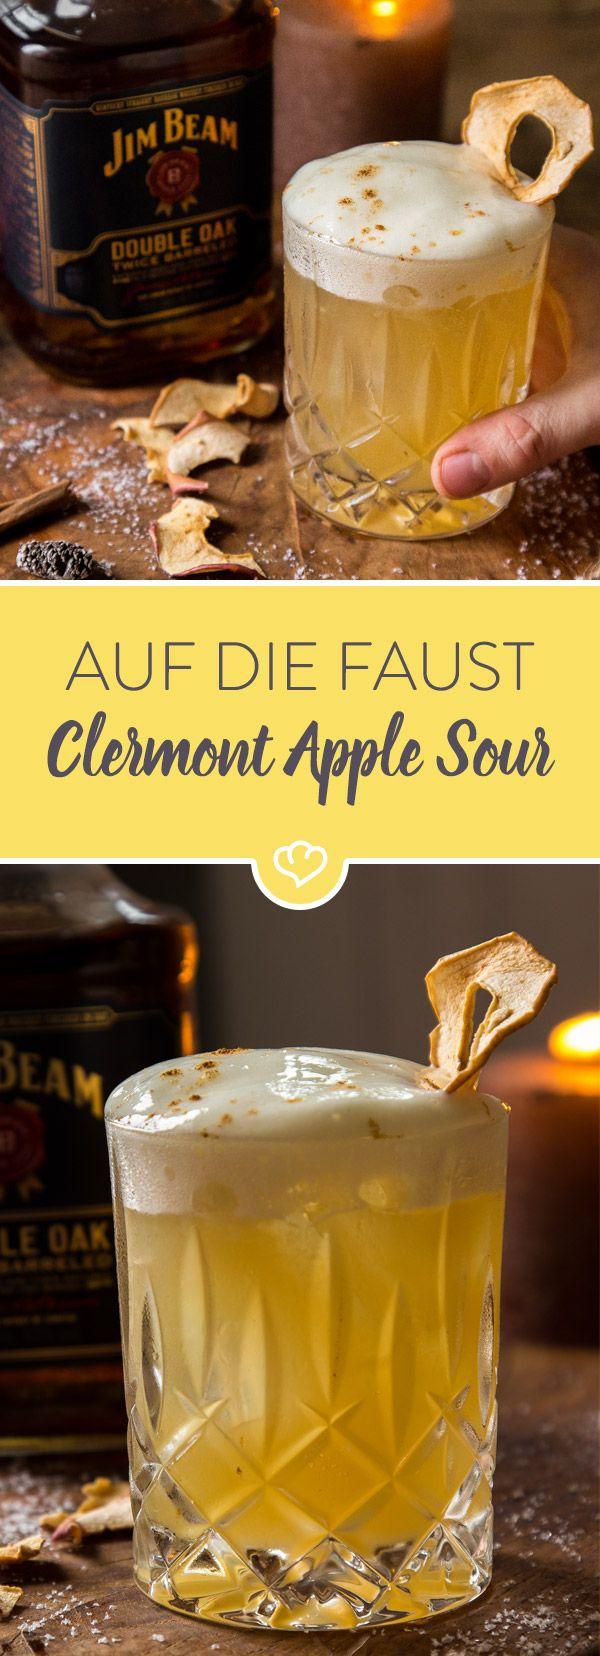 clermont apple sour rezept silvester party drinks. Black Bedroom Furniture Sets. Home Design Ideas